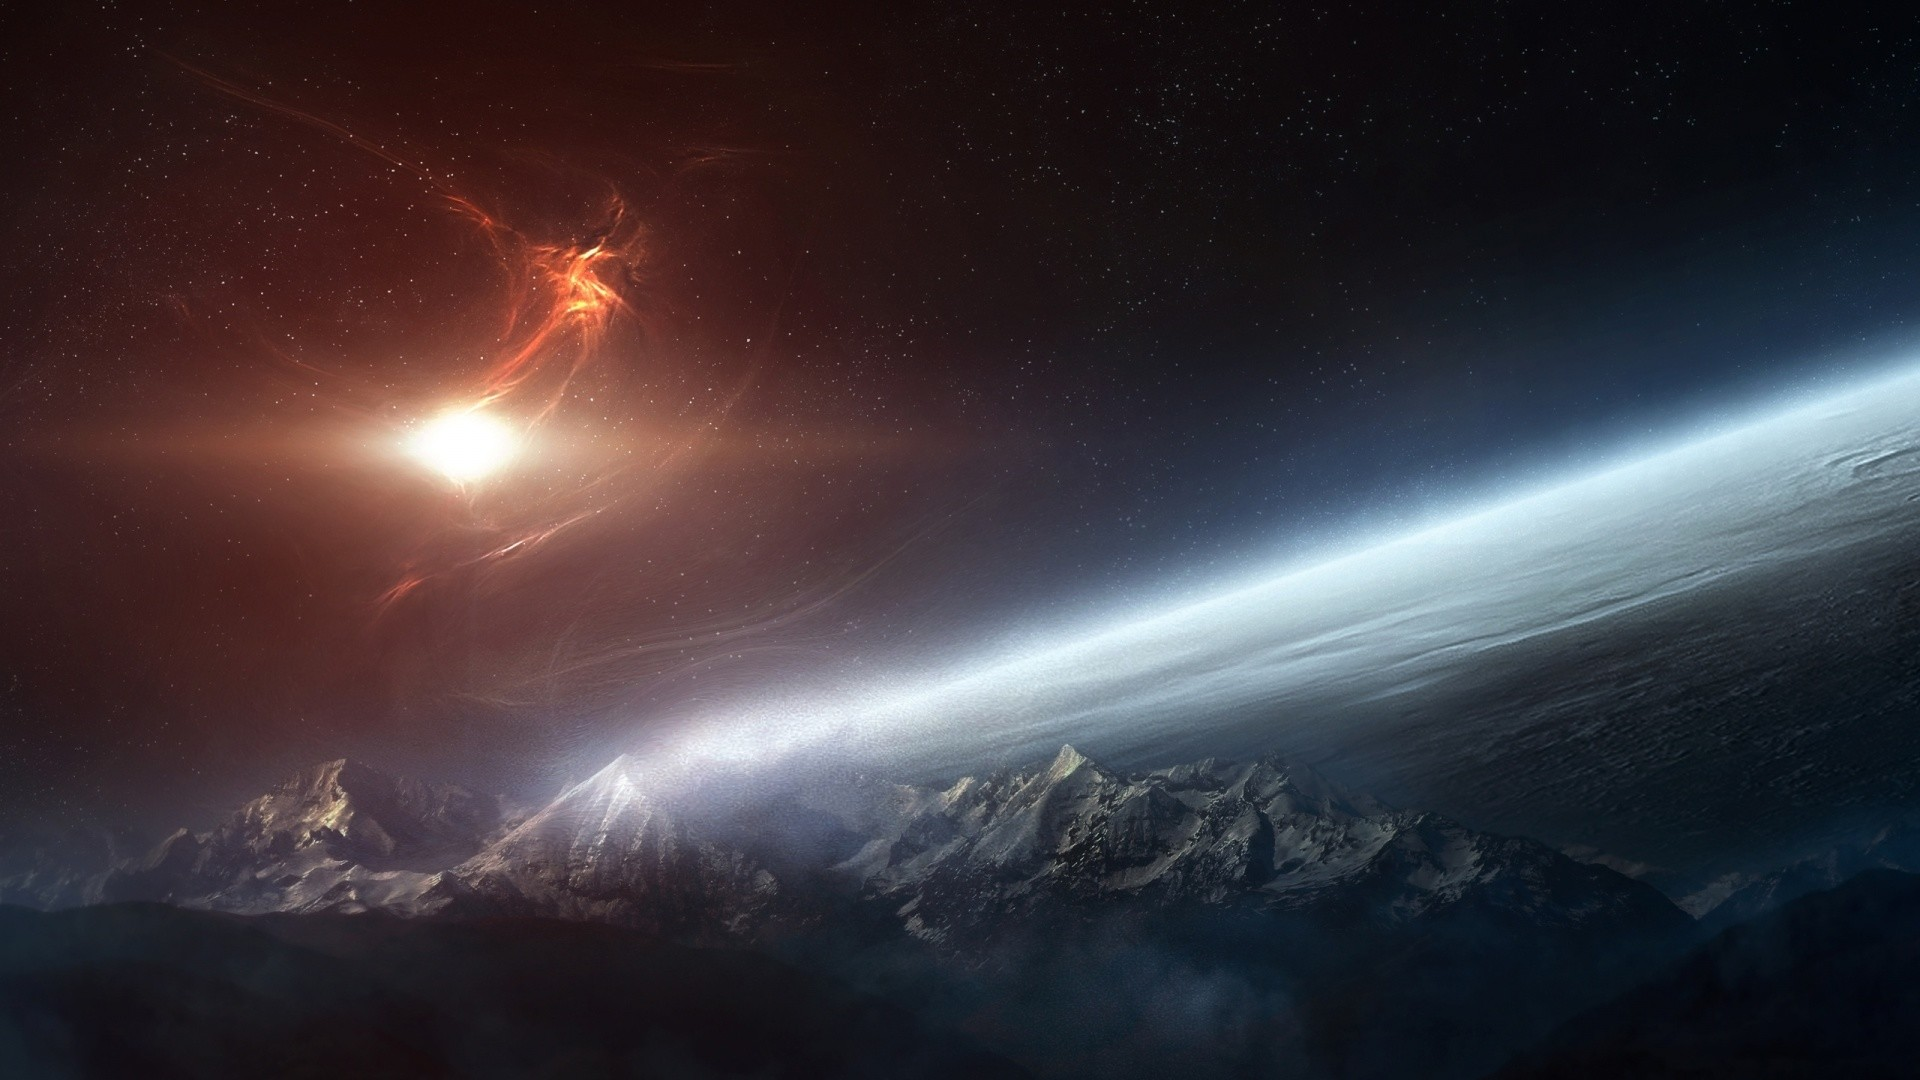 Space Wallpaper wallpaper – 721895